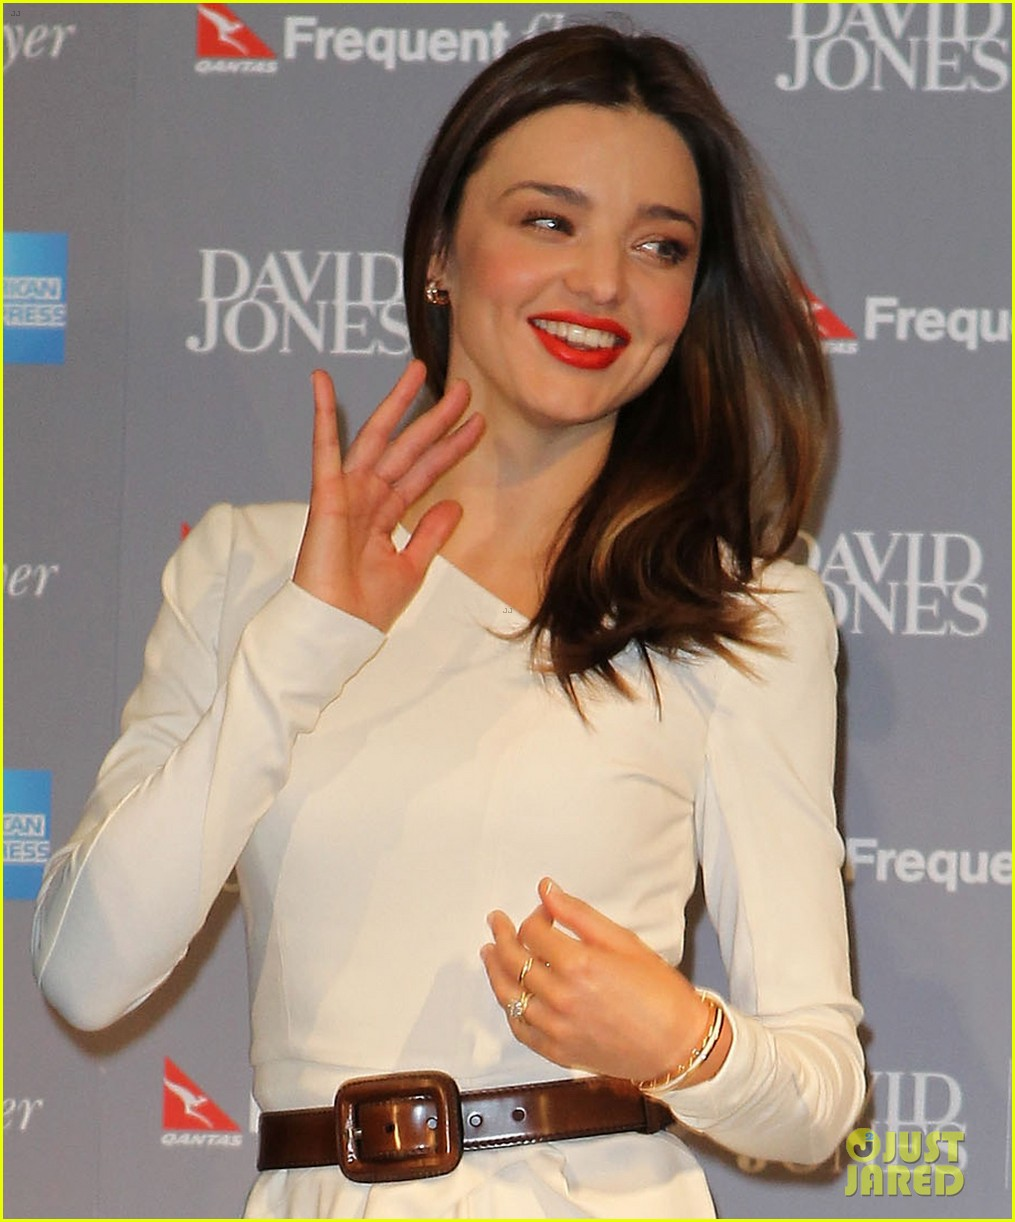 White dress david jones -  Store Details David Jones Miranda Kerr Spring Summer 2011 Fashion Show Red Sequin